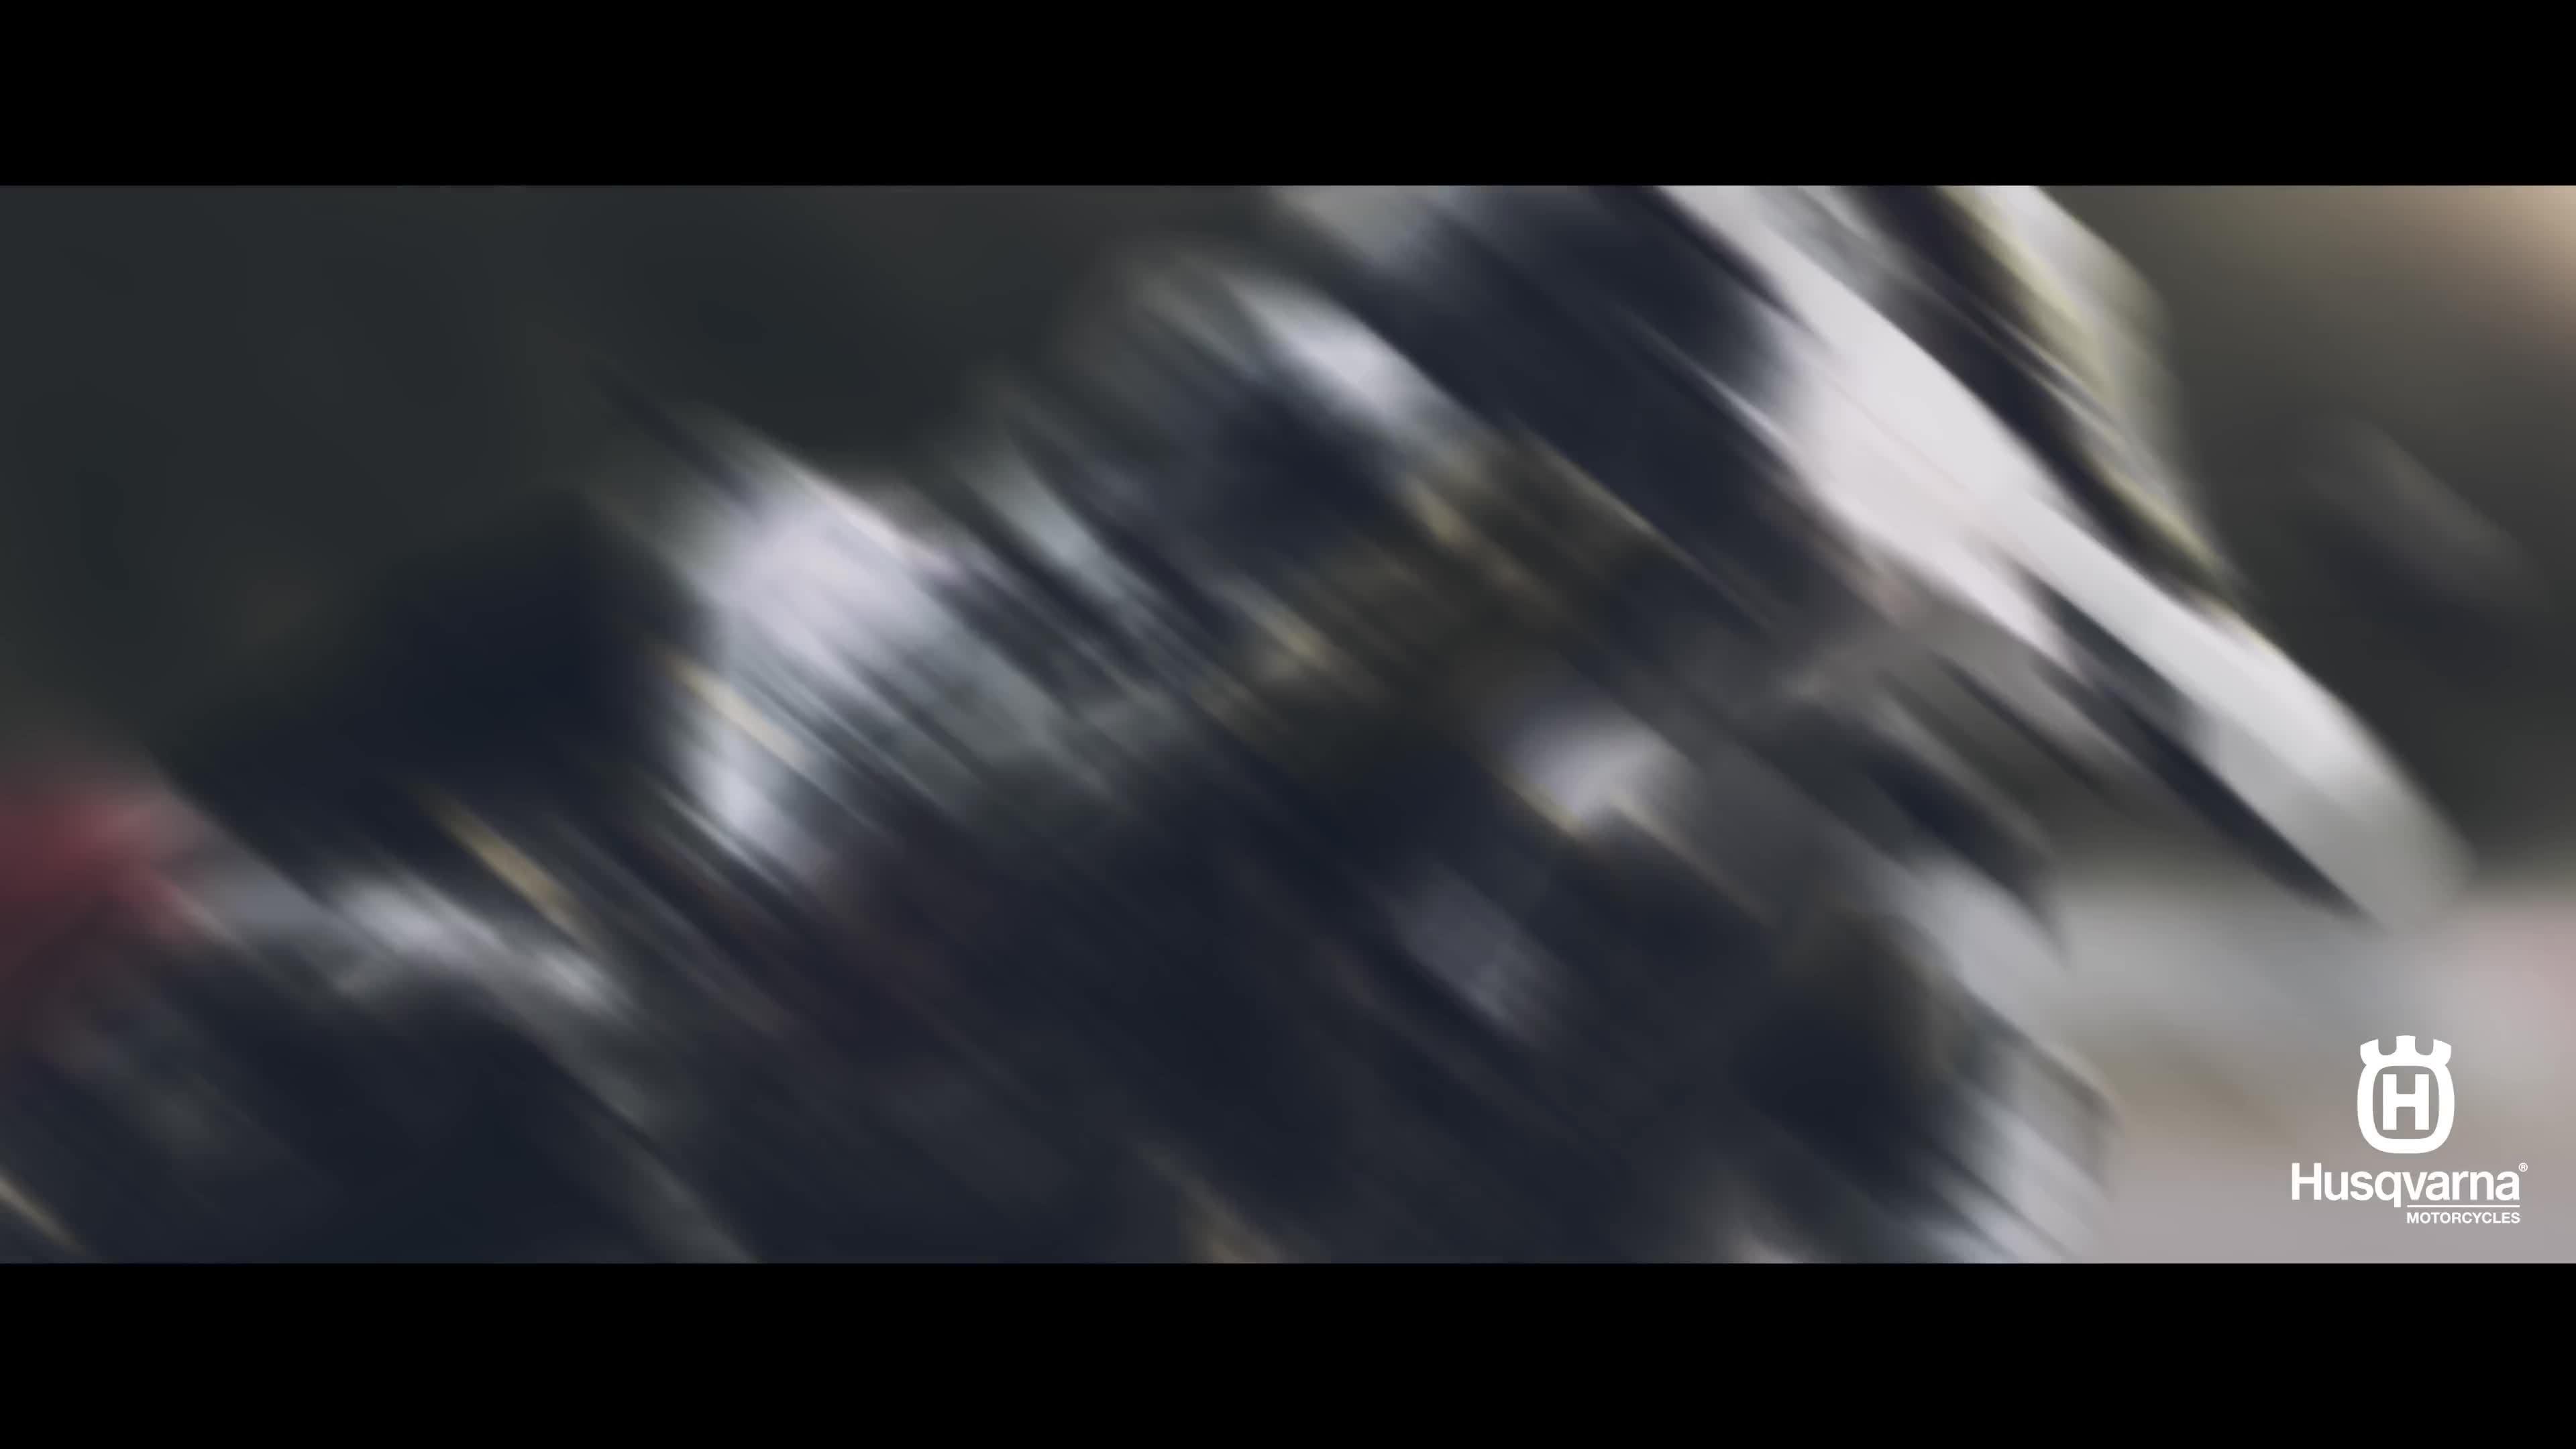 Husky, Husqvarna, motorcycles, Husqvarna 701 SUPERMOTO - The Curve GIFs